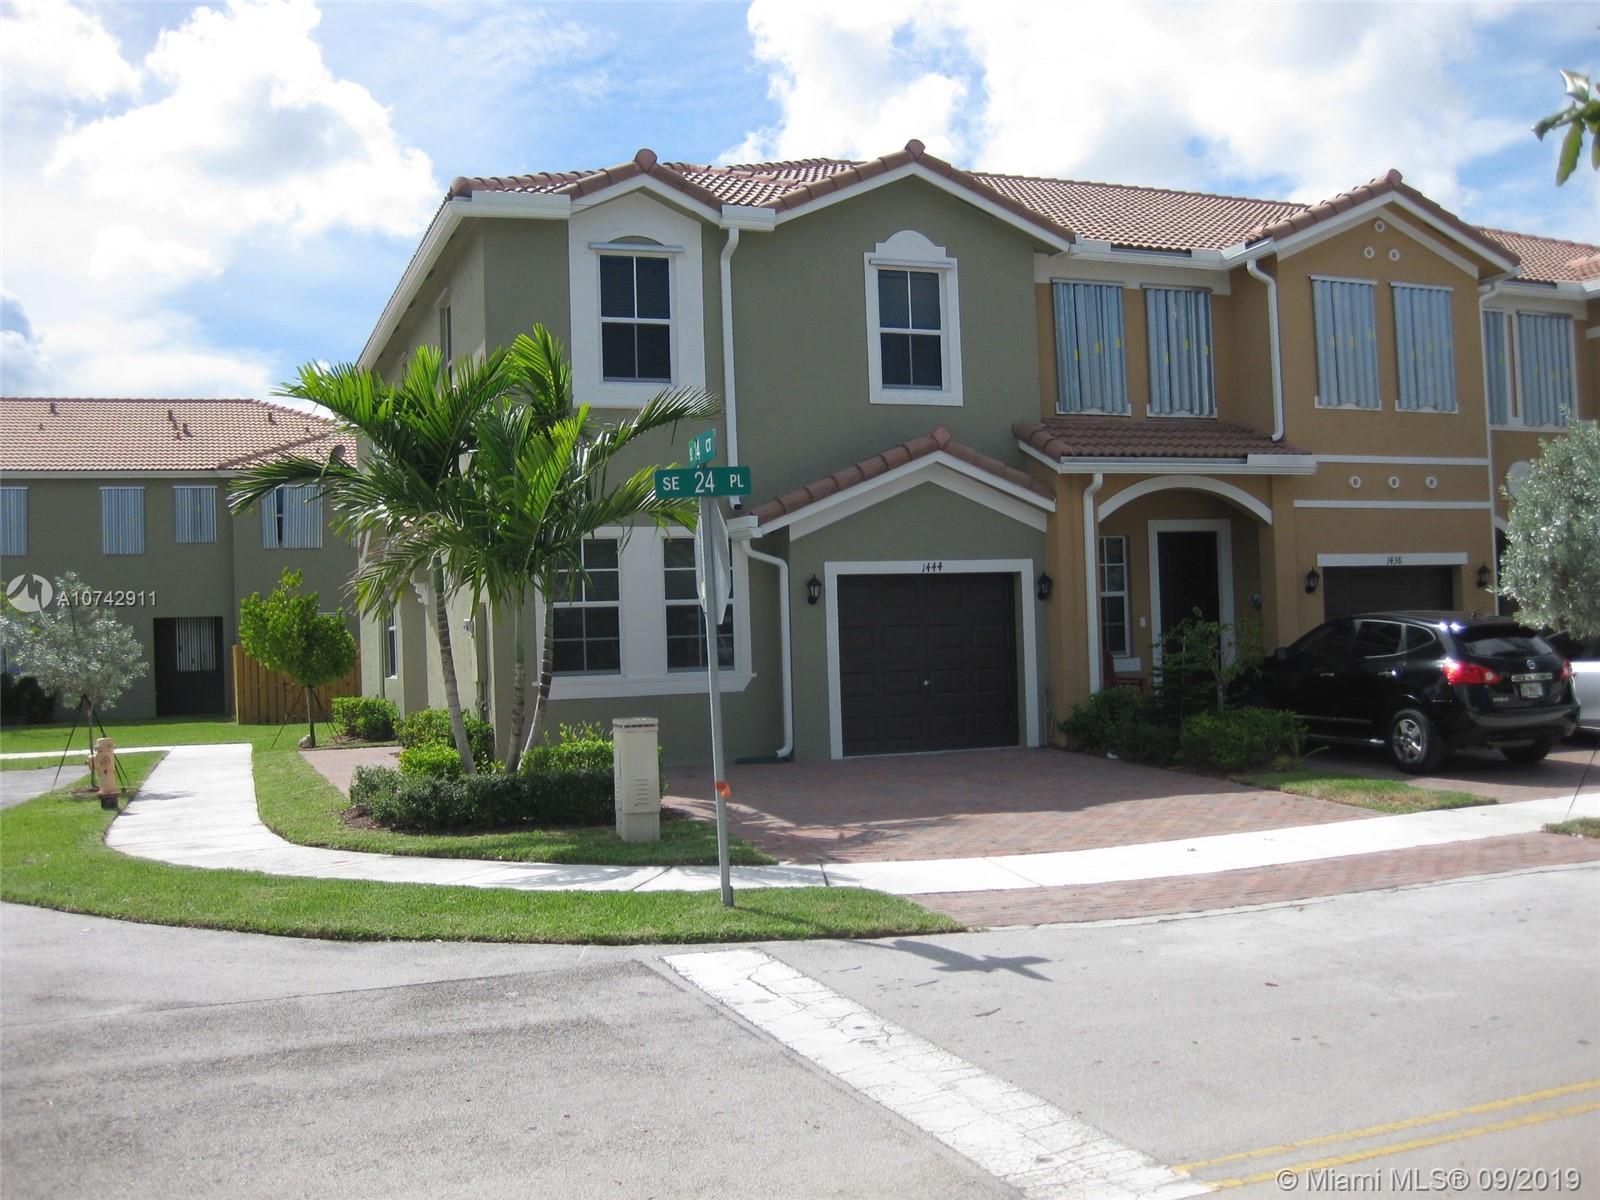 1444 SE 24th Pl, Homestead, FL 33035 - Homestead, FL real estate listing